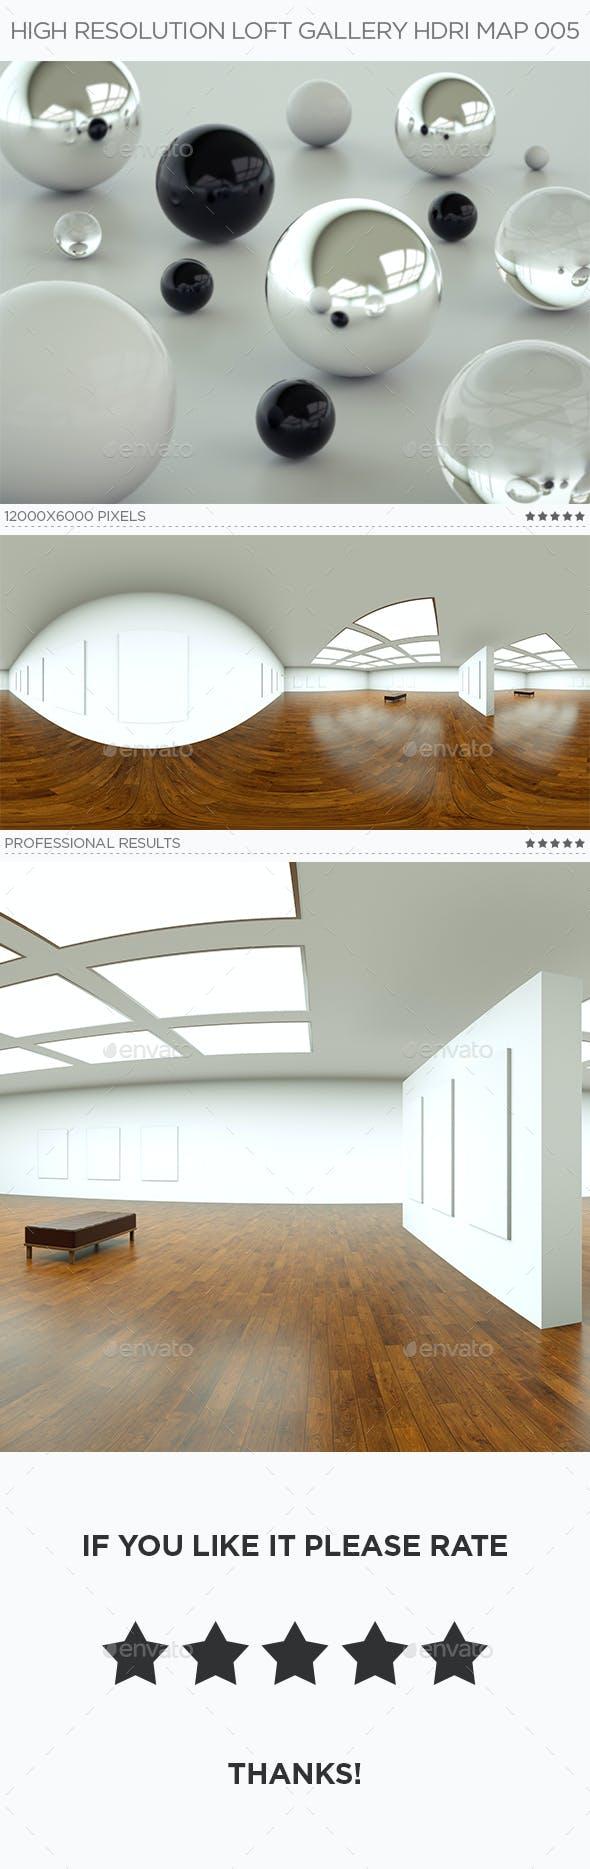 High Resolution Loft Gallery HDRi Map 005 - 3DOcean Item for Sale